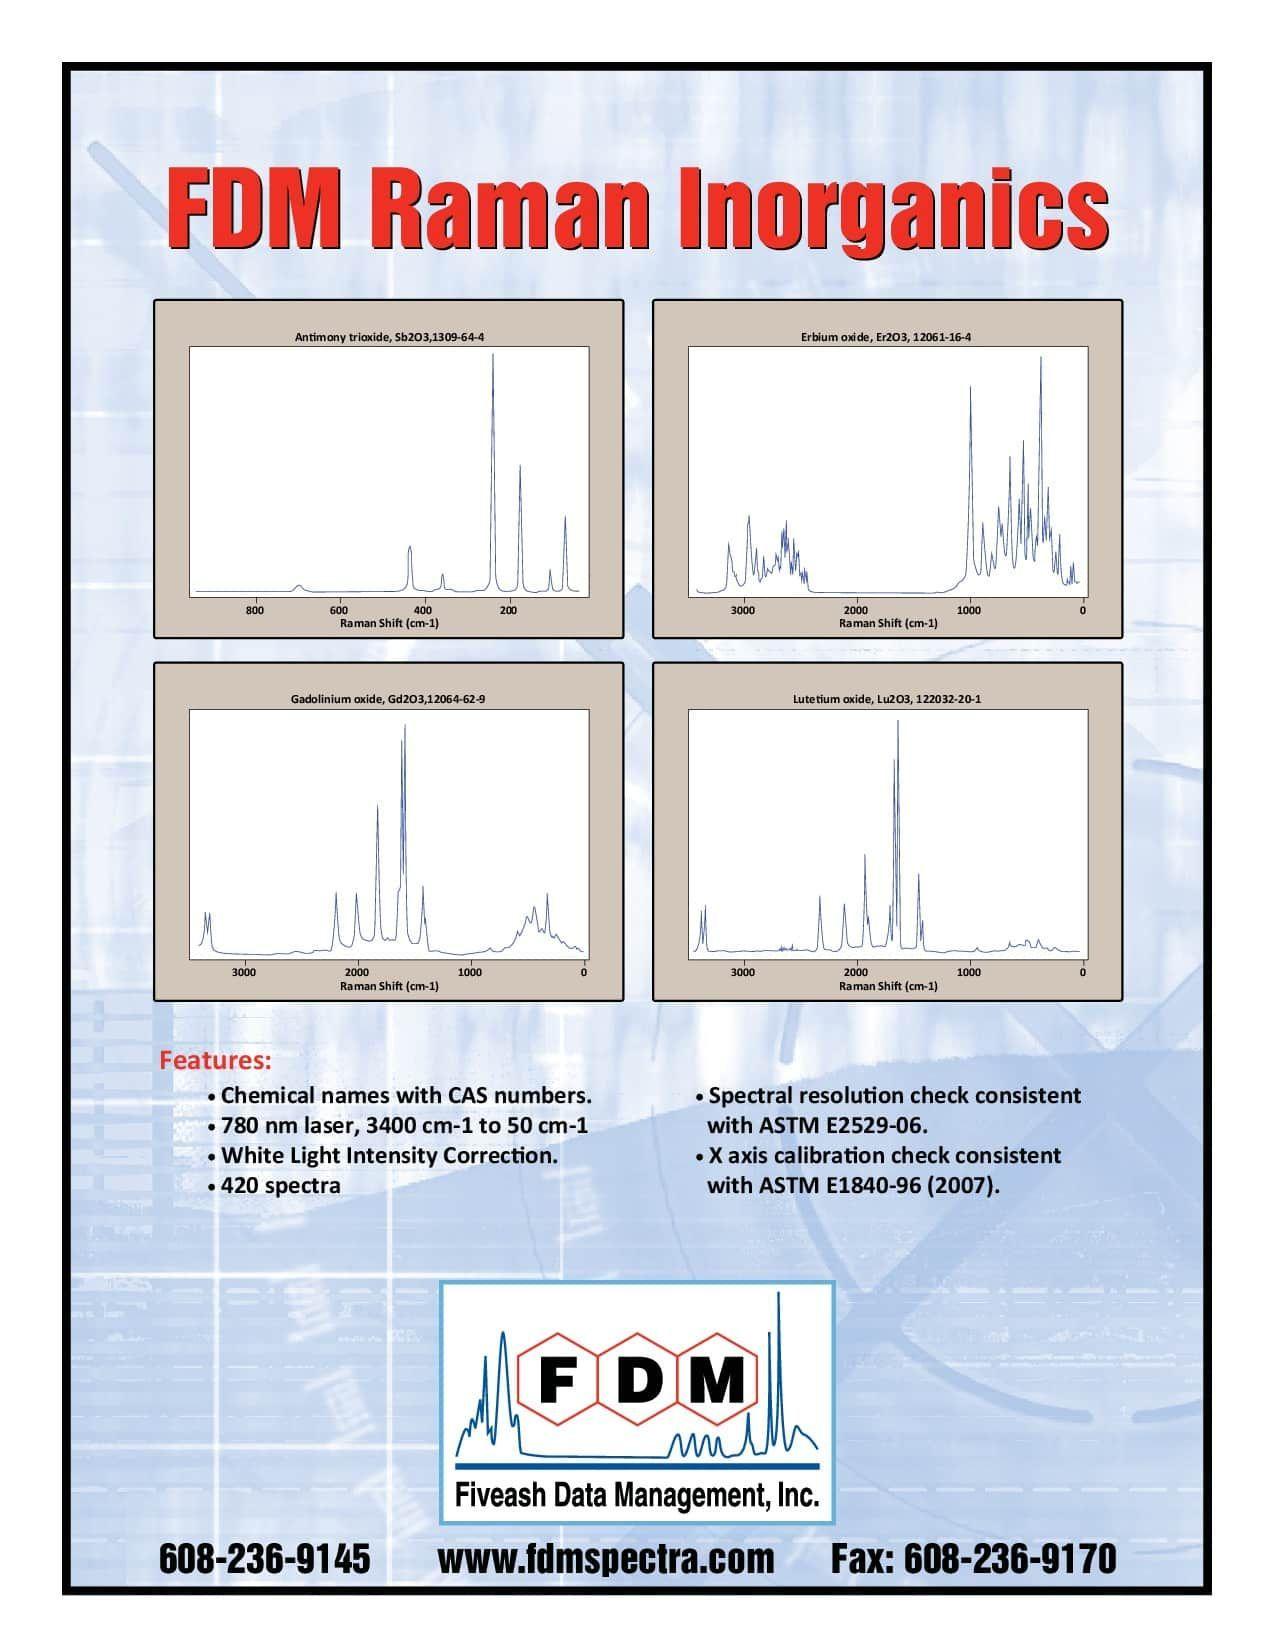 FDM Raman Inorganics